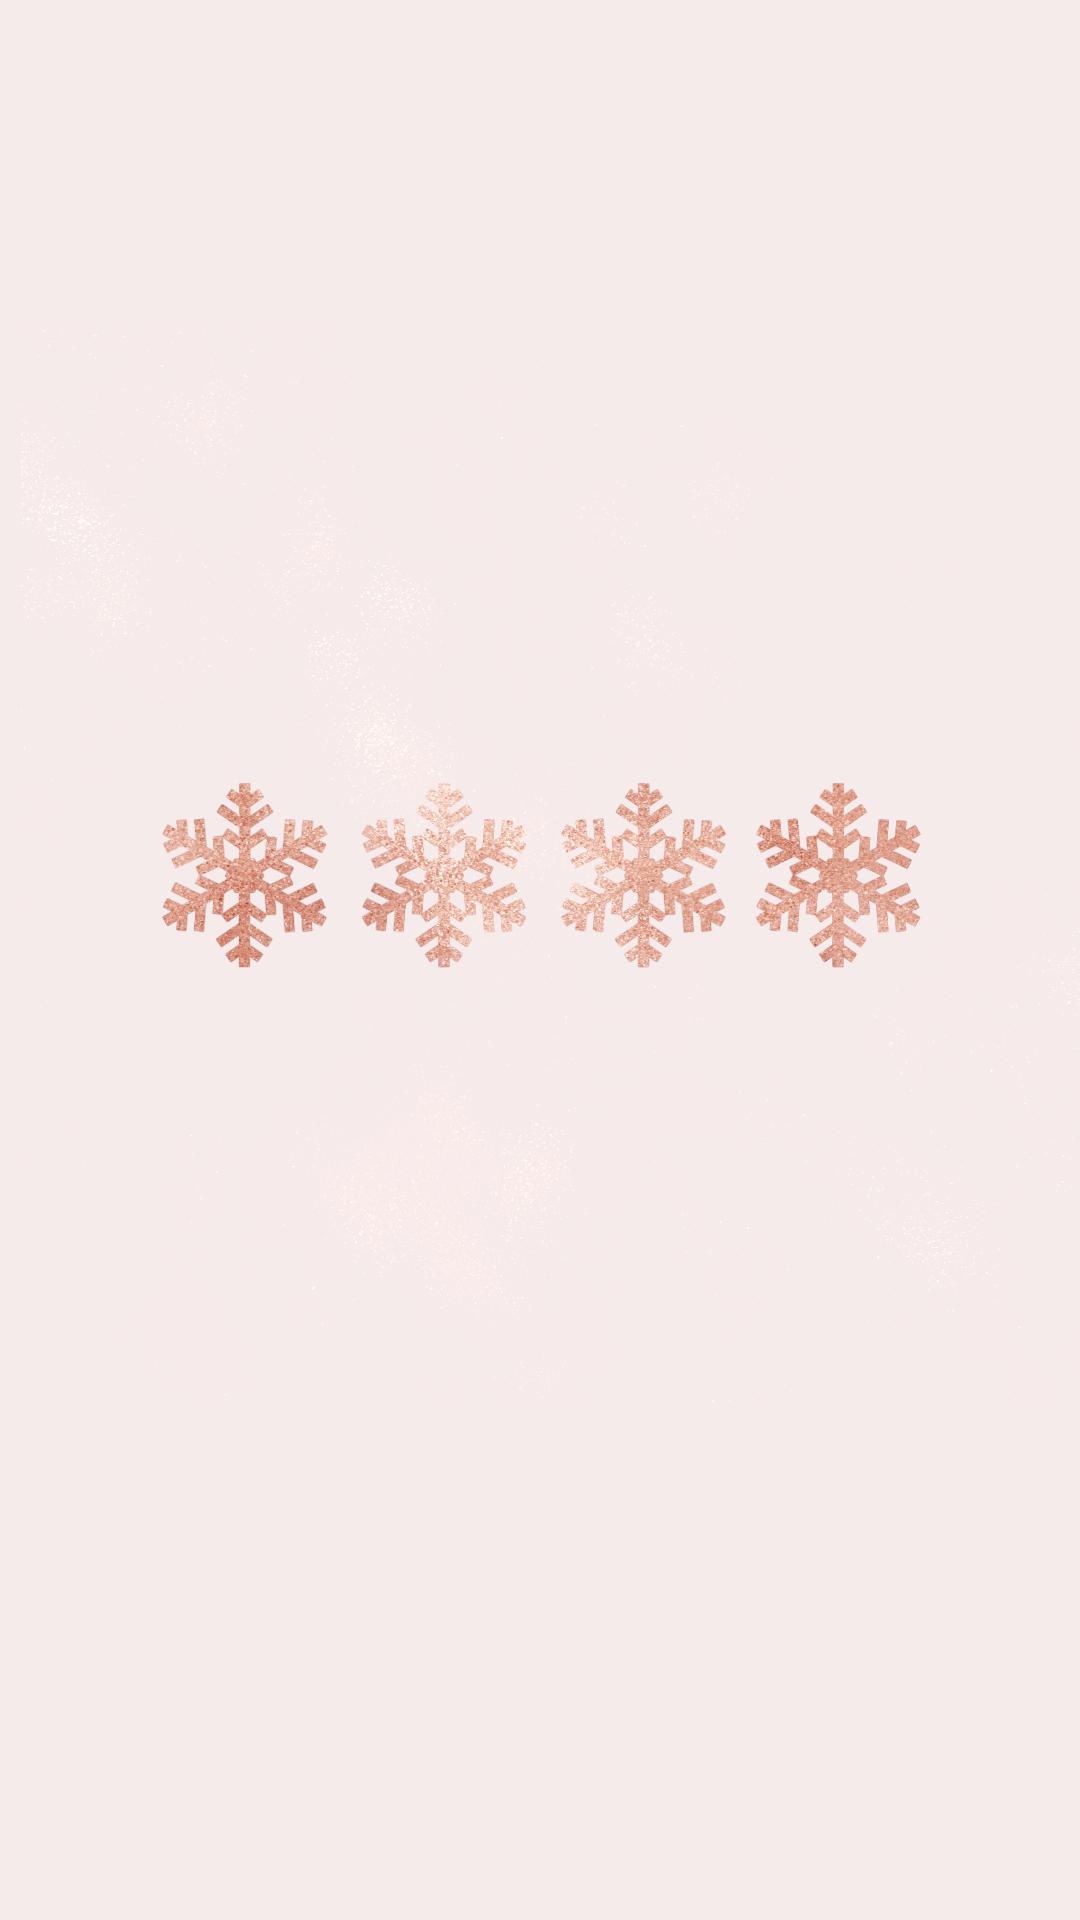 Free Christmas Phone Wallpapers - Corrie Bromfield